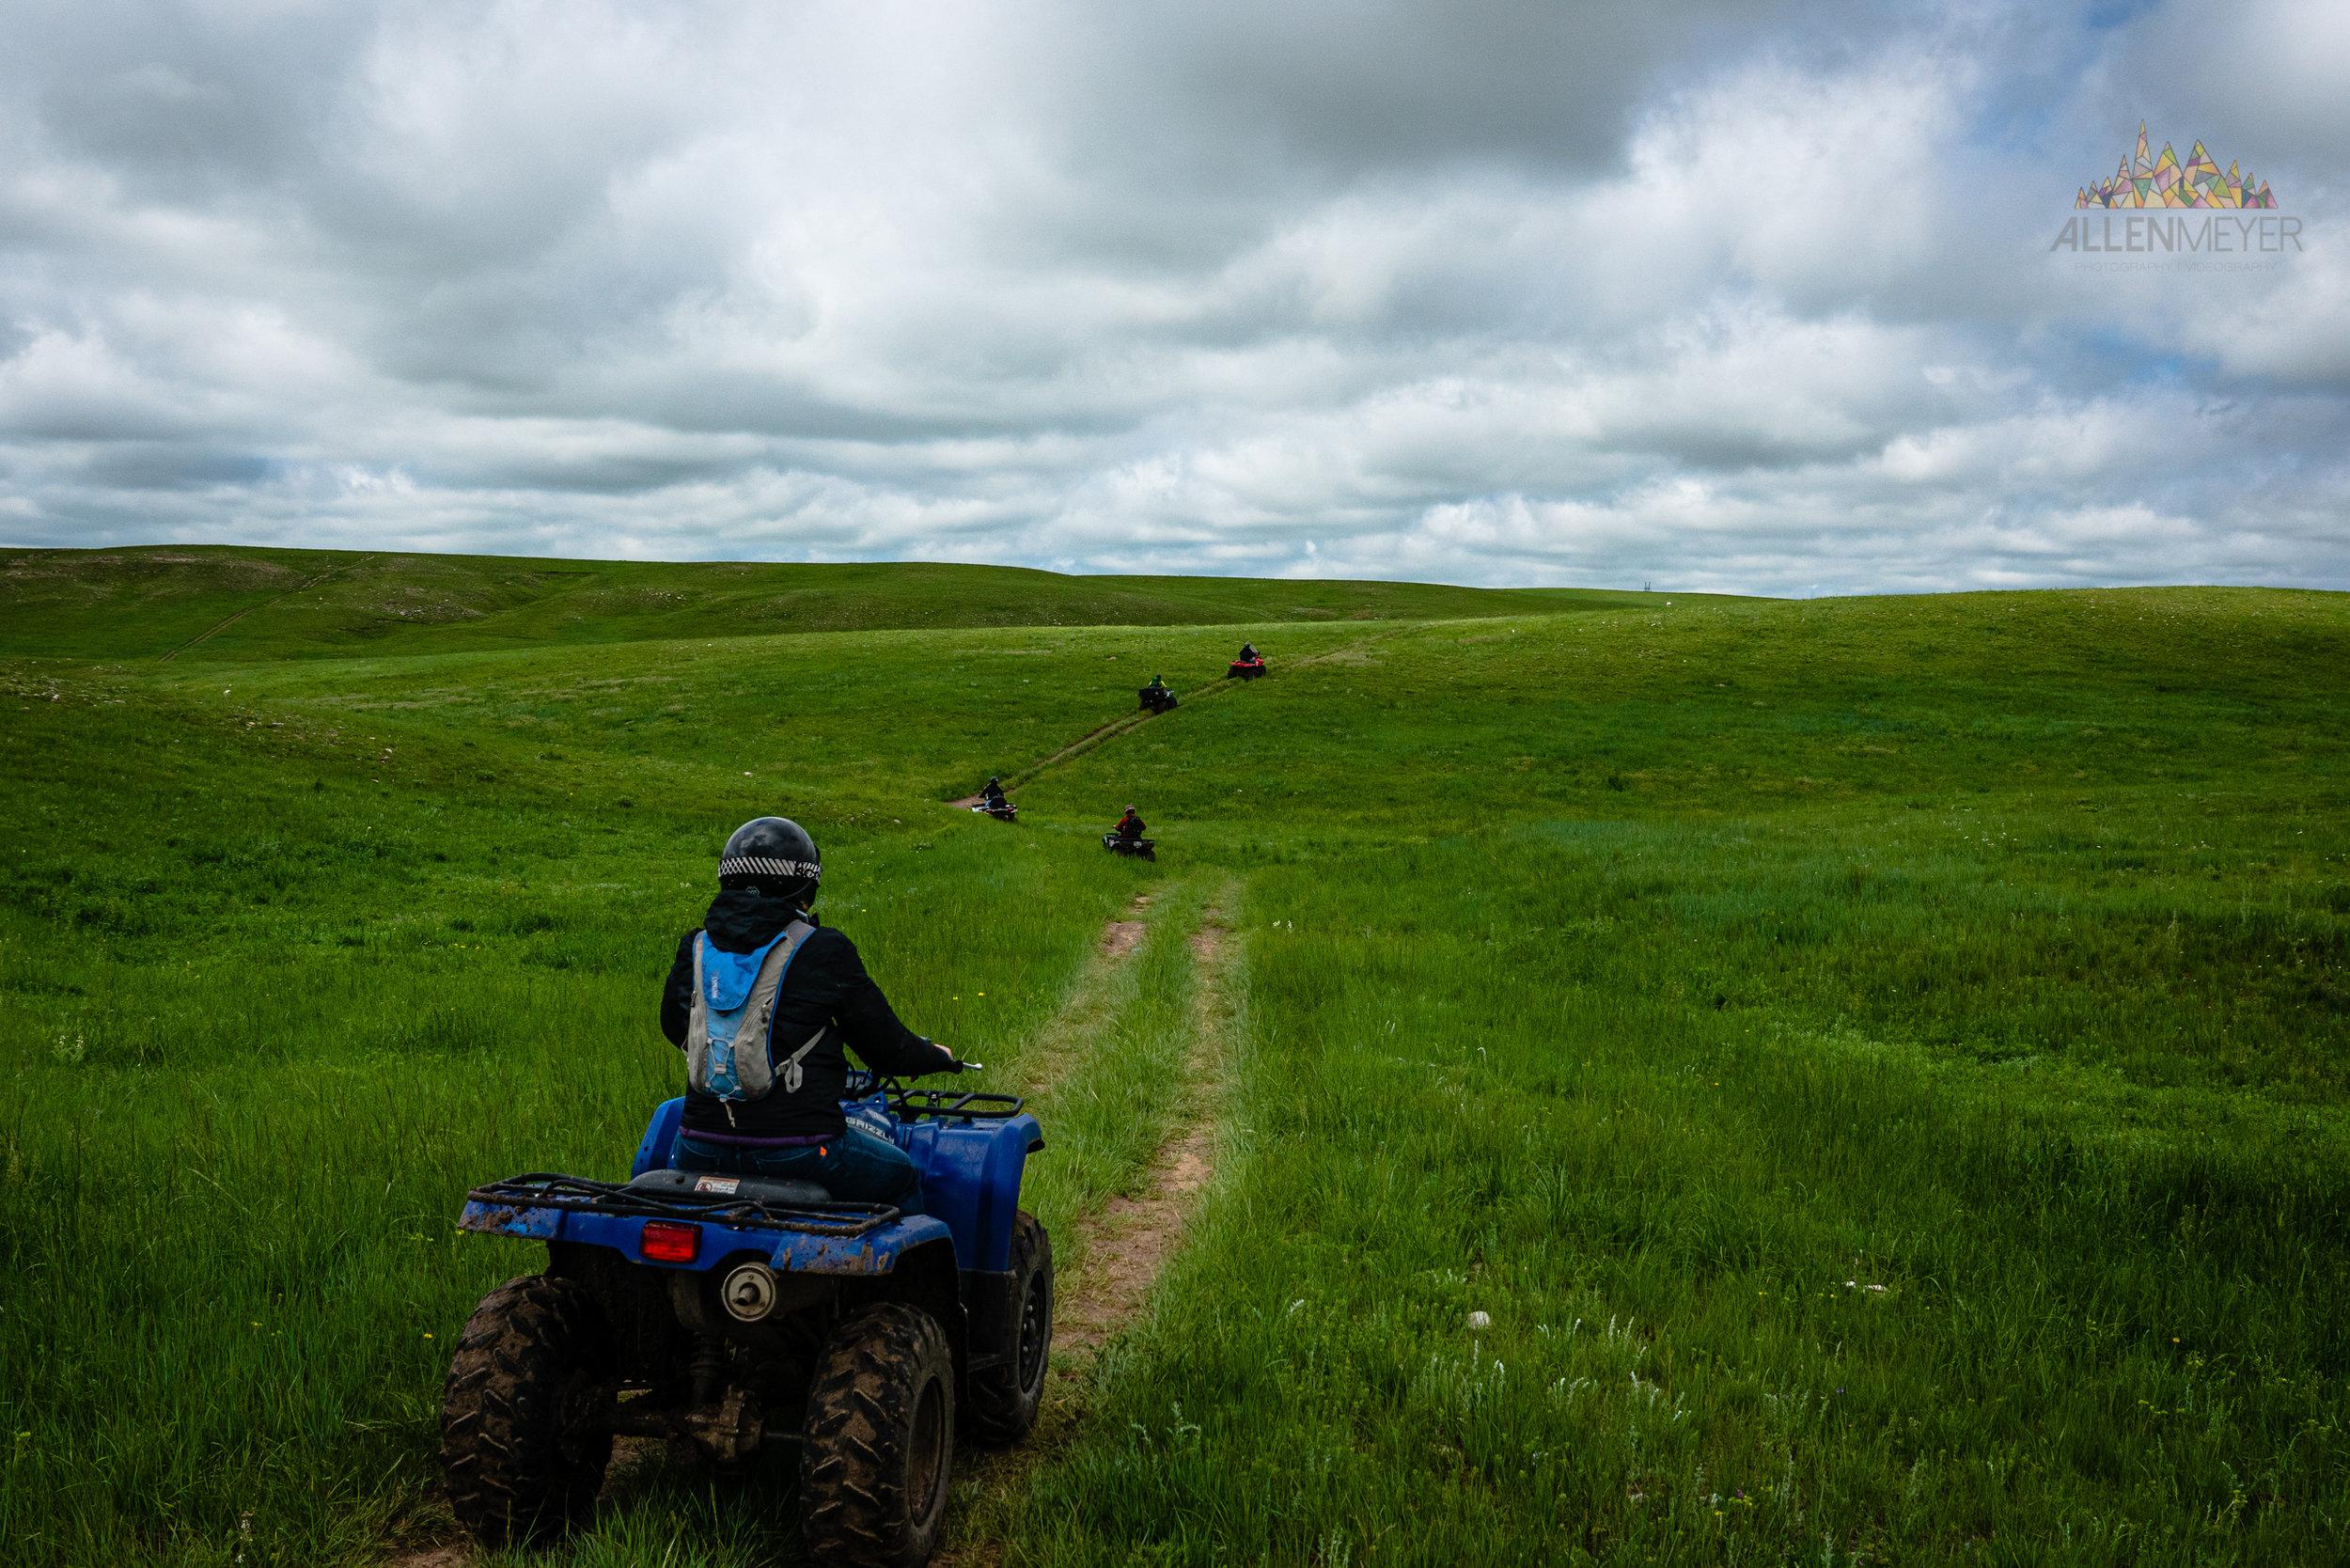 Outdoor Adventures In Cheyenne, Wyoming; Photography by Allen Meyer-03652.jpg